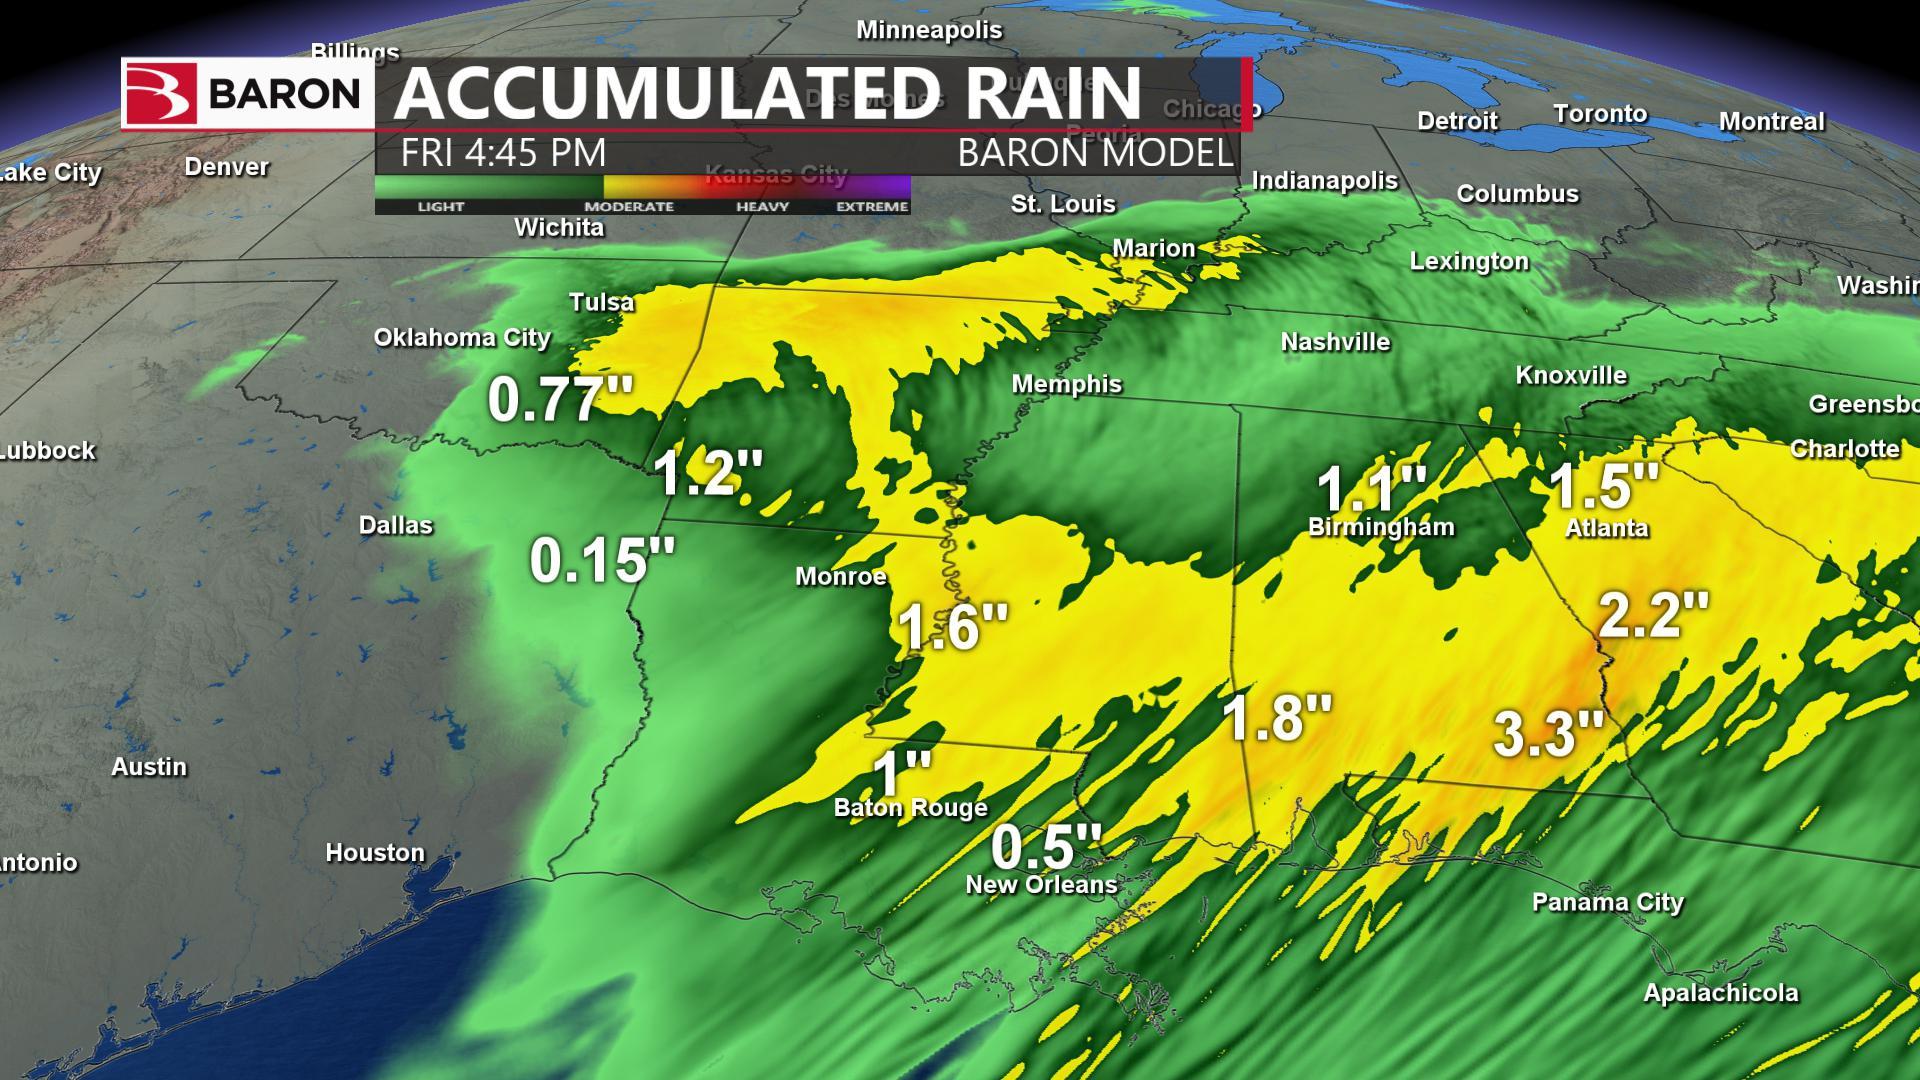 baron model rain accumulation